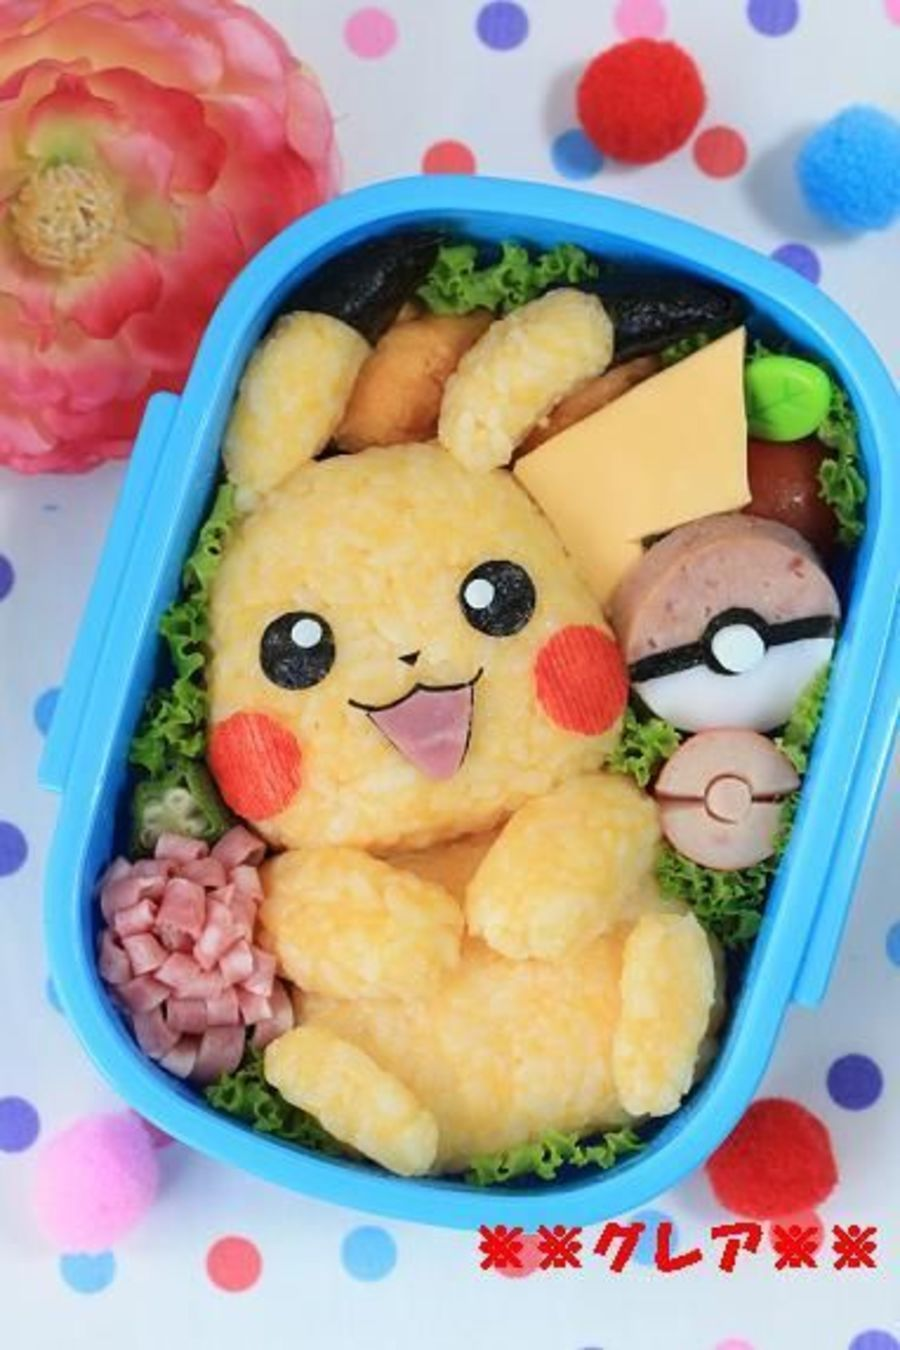 Japanese Anime Food Recipes